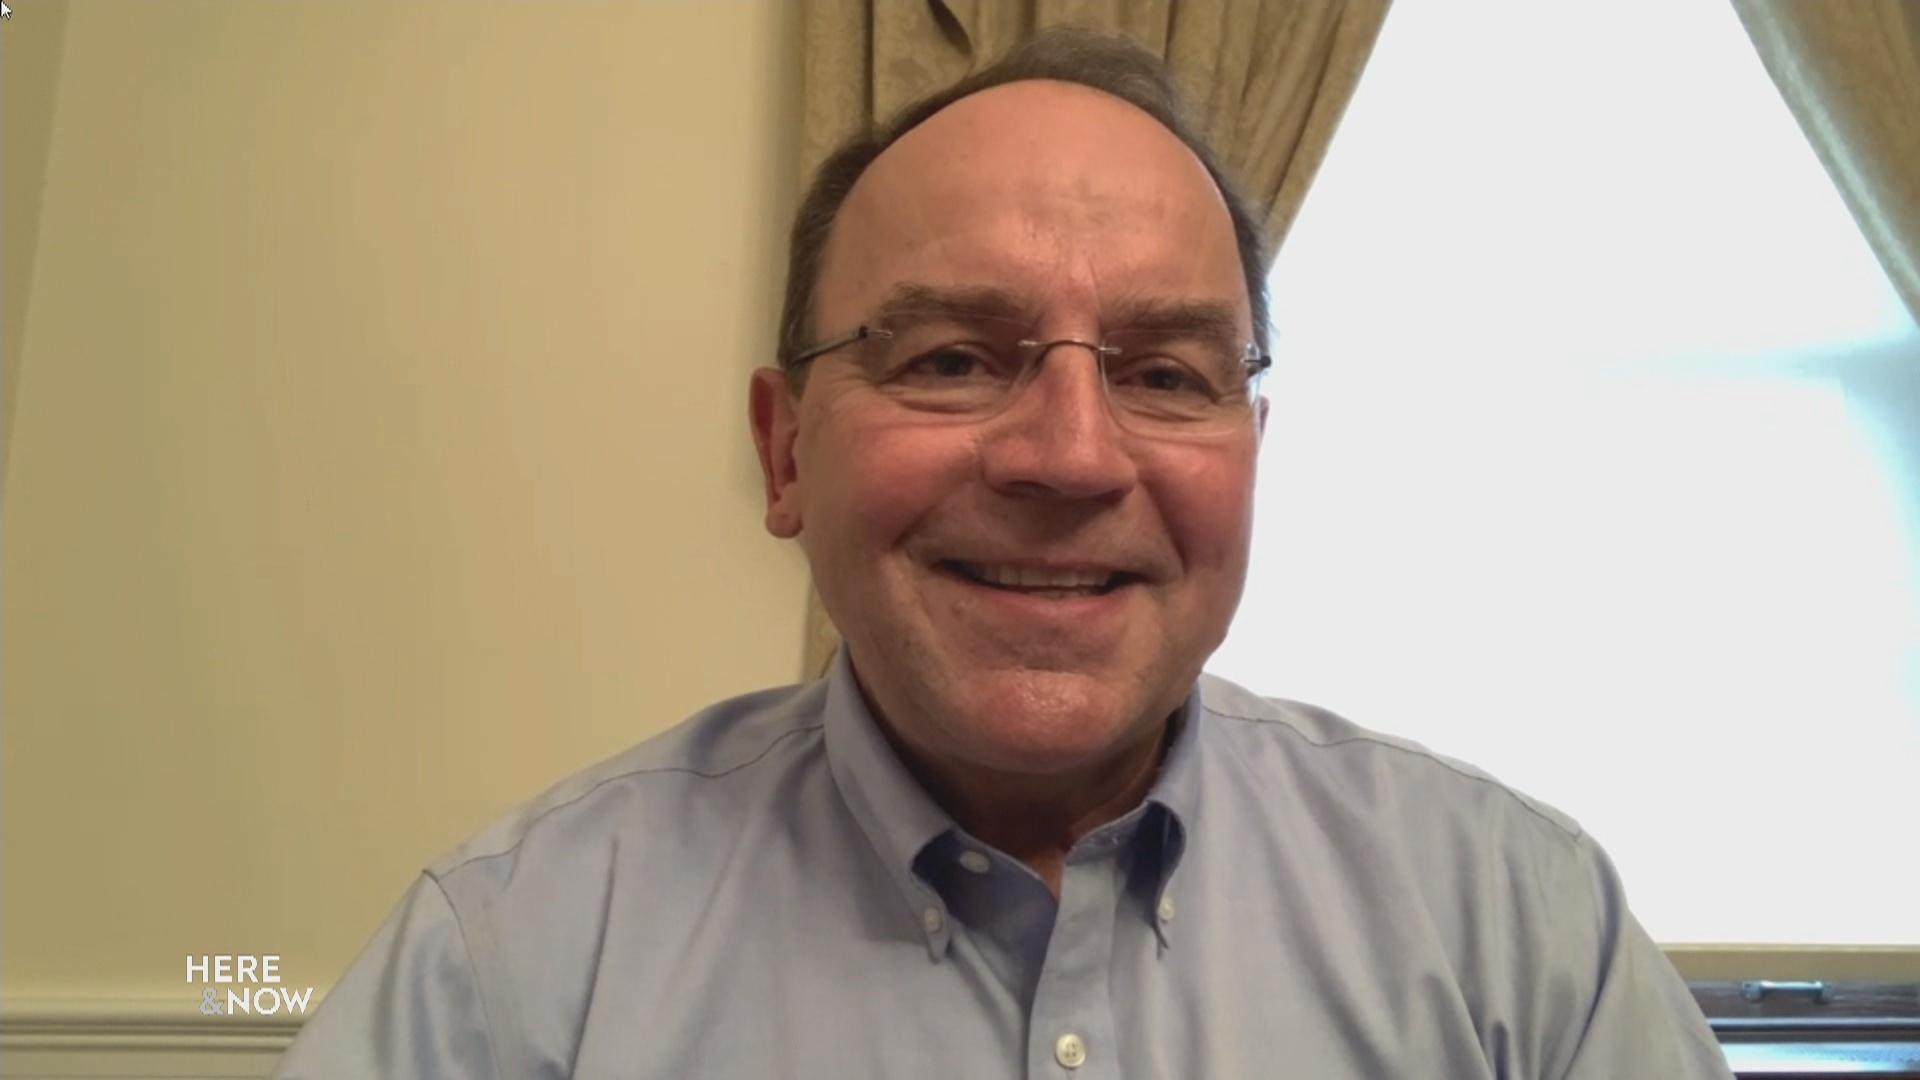 U.S. Rep. Tom Tiffany (R) on the Hectic Week in Washington